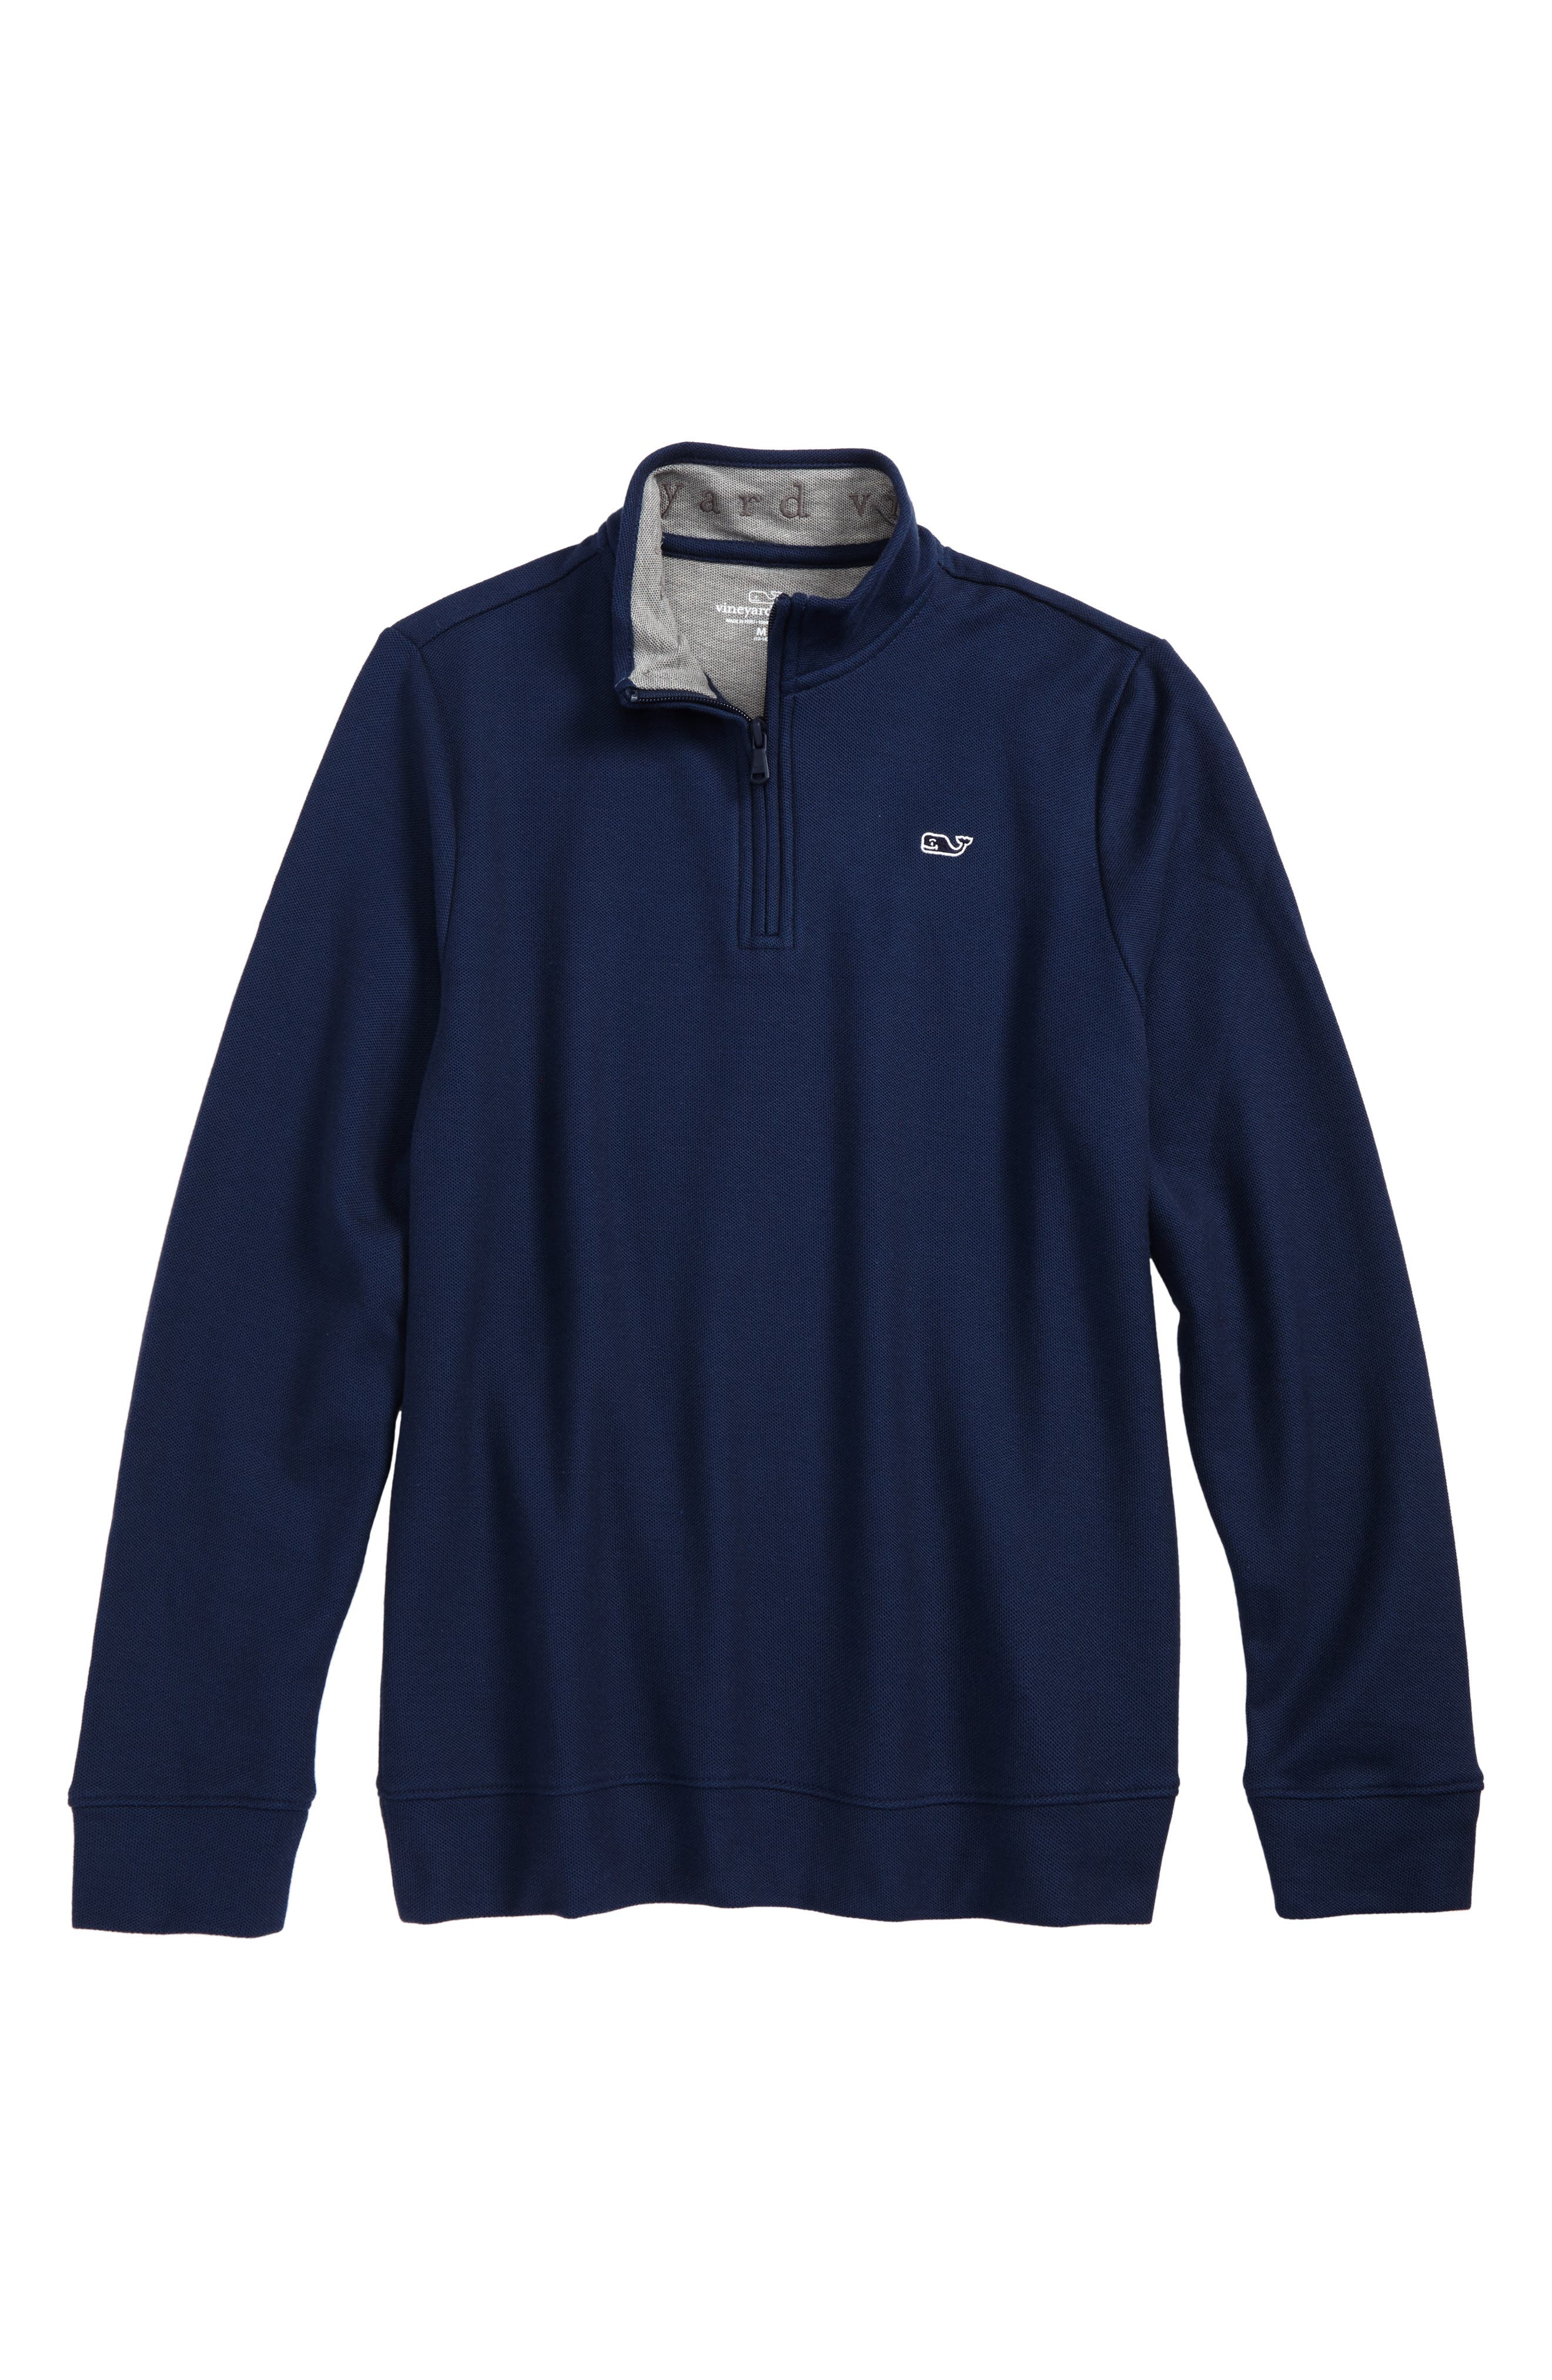 Boys Vineyard Vines Quarter Zip Pullover Size M (1214)  Blue